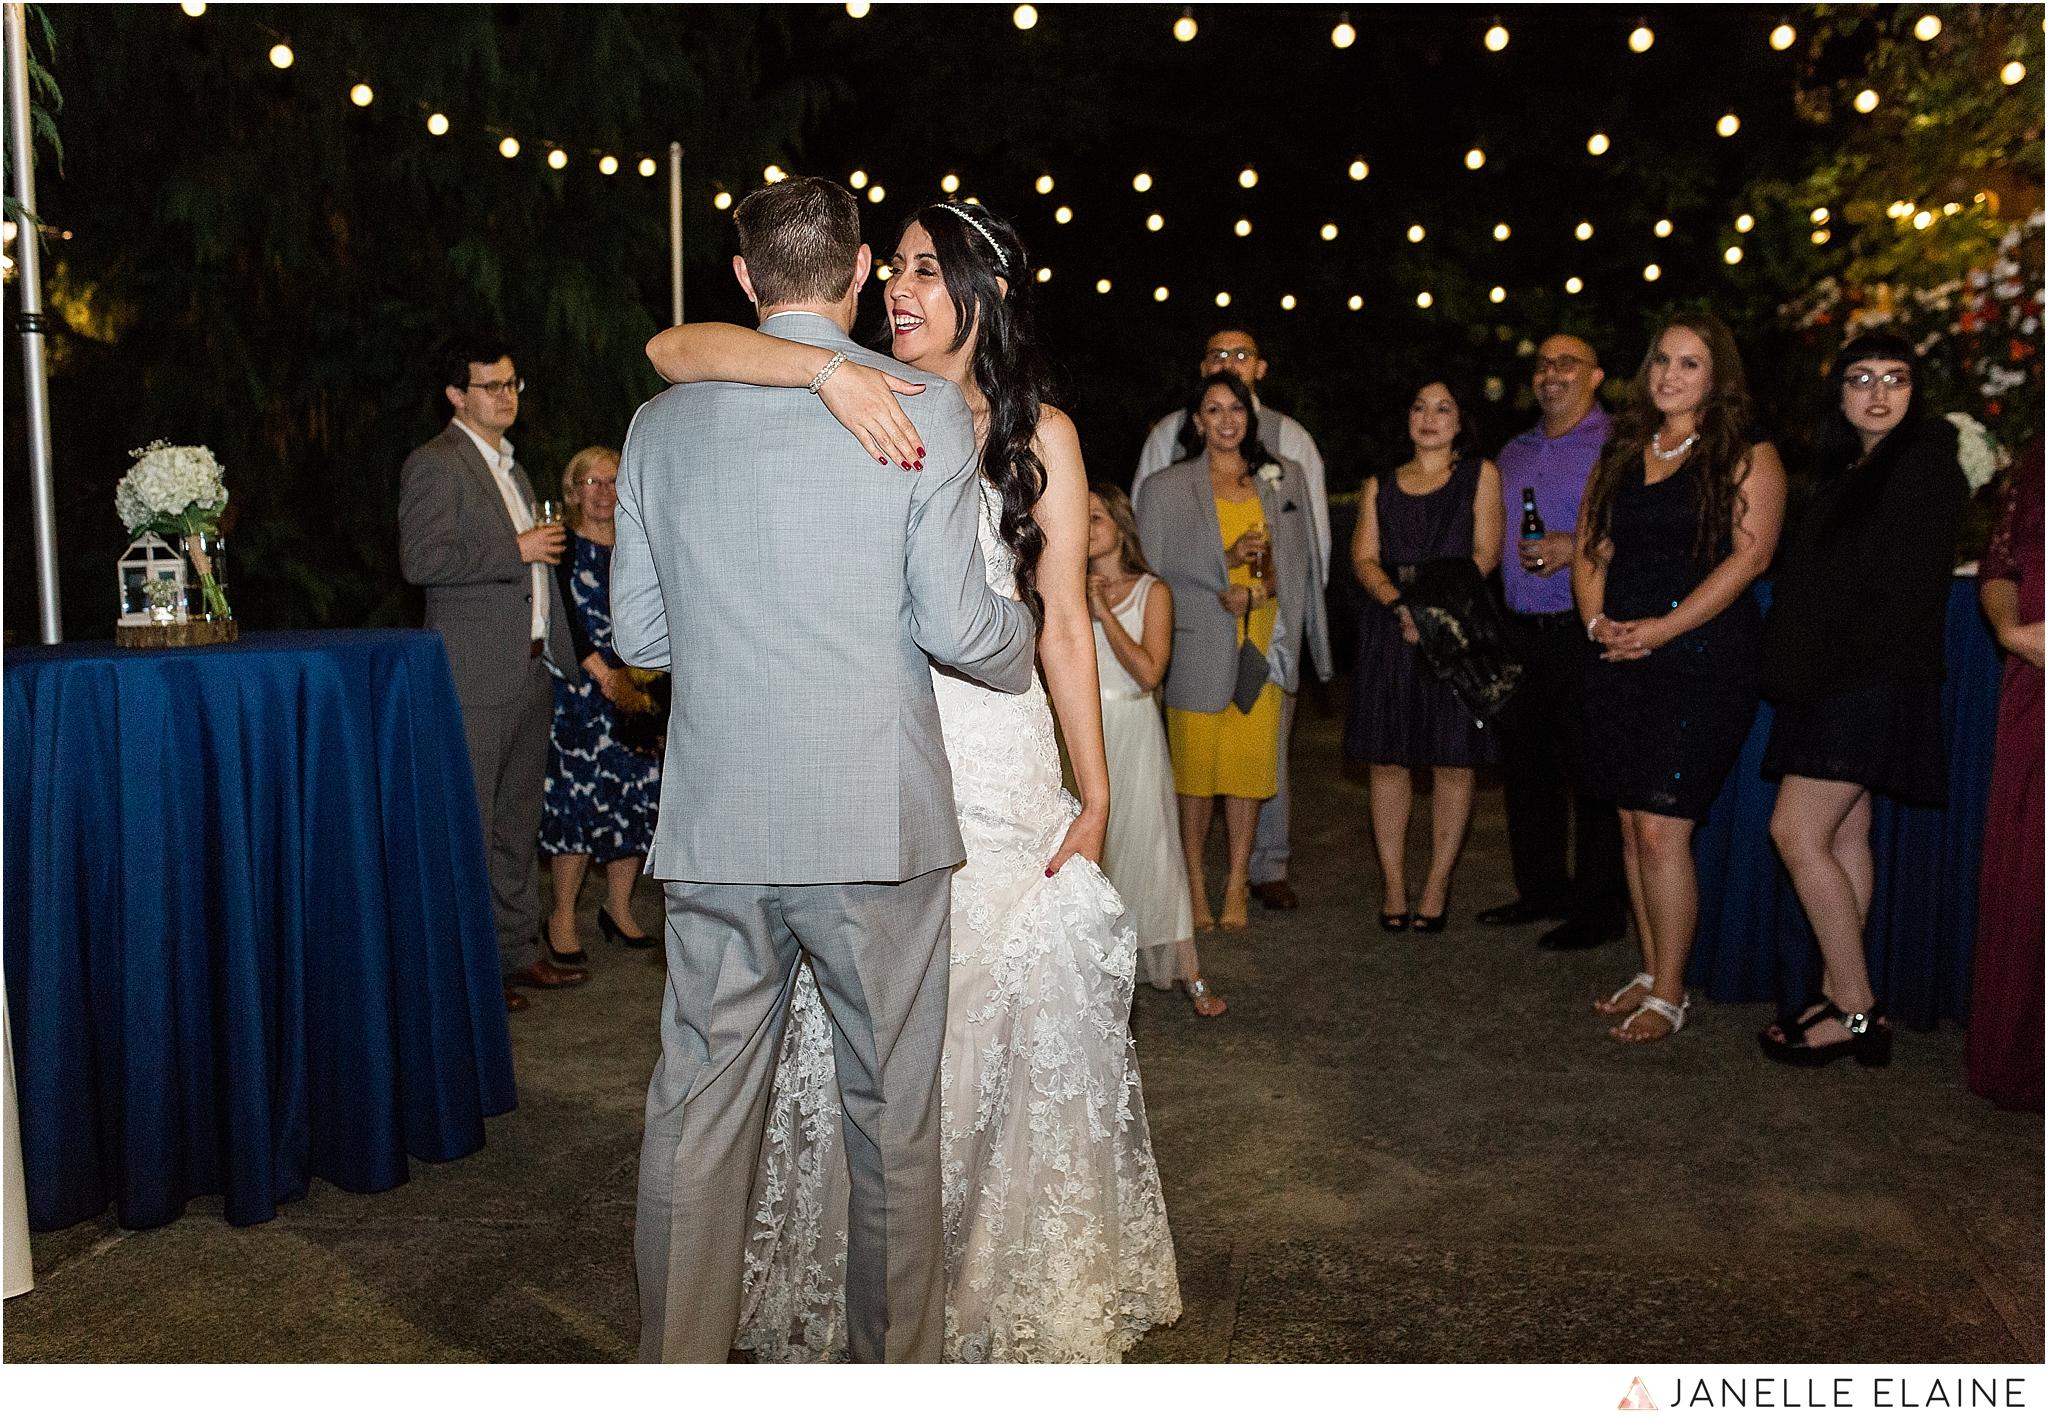 janelle elaine photography-professional wedding photographer-seattle-bellevue-robinswood house-276.jpg